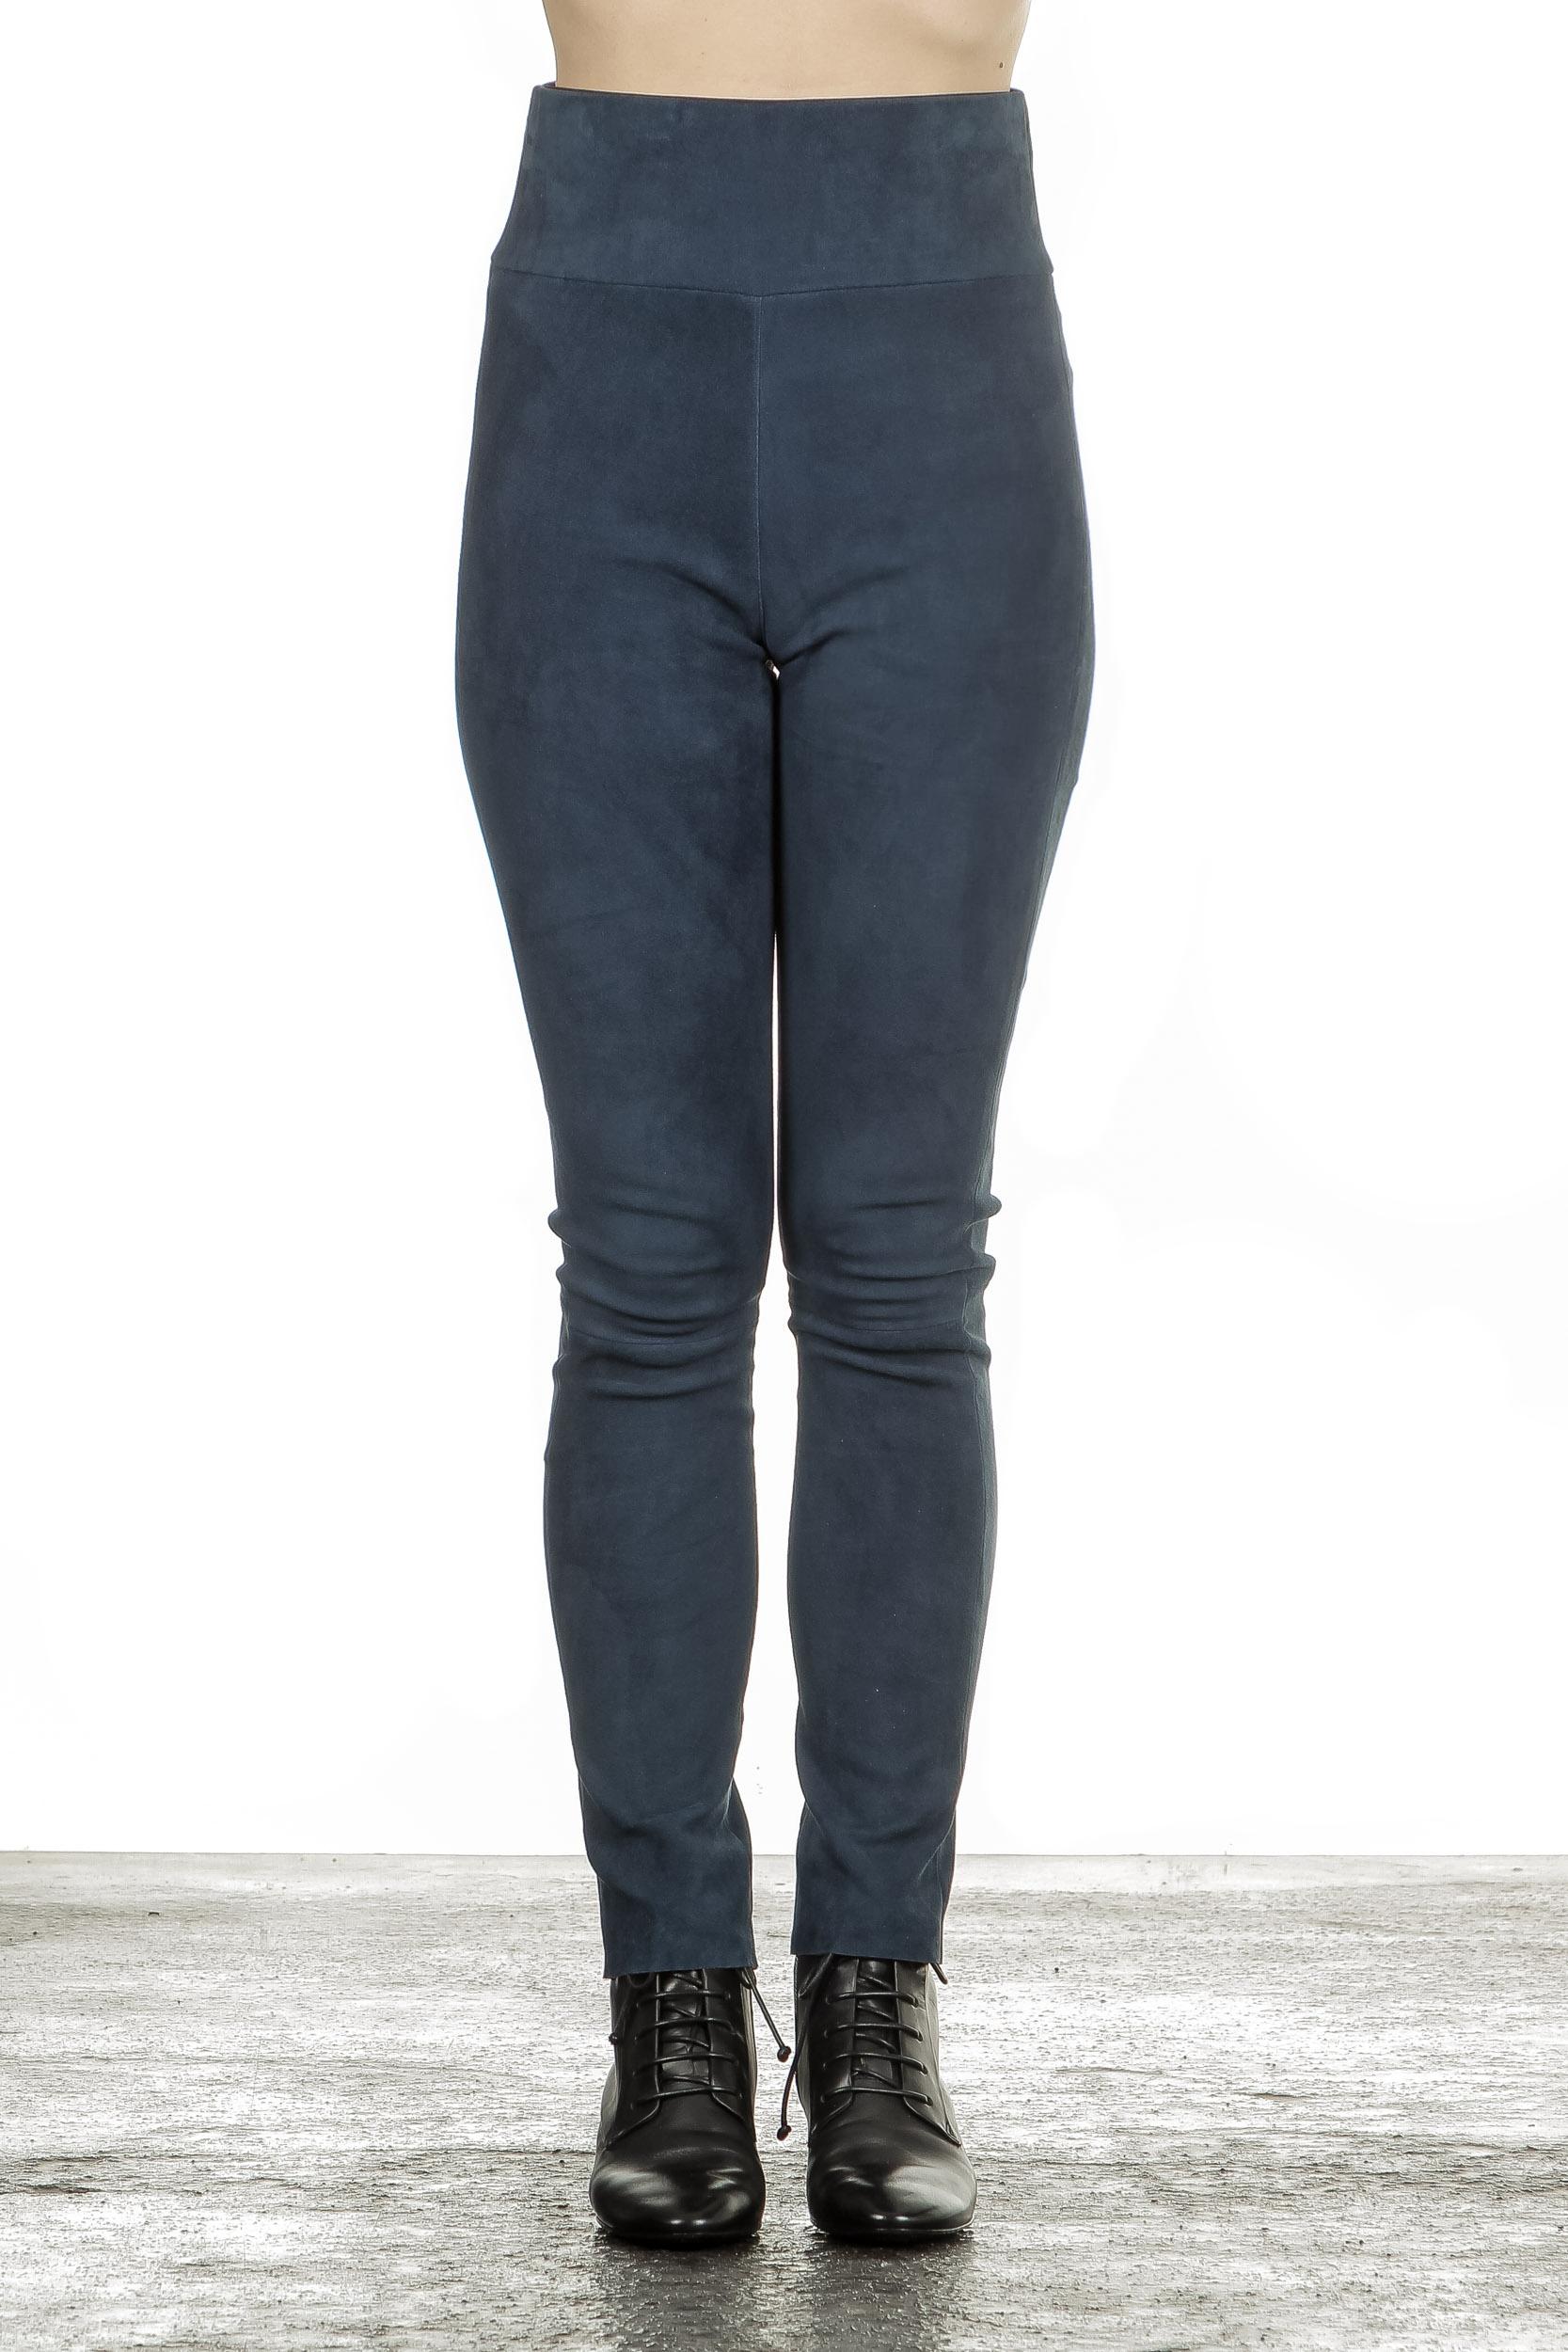 Hosen - DROMe Damen Leder Leggings indigo  - Onlineshop Luxury Loft